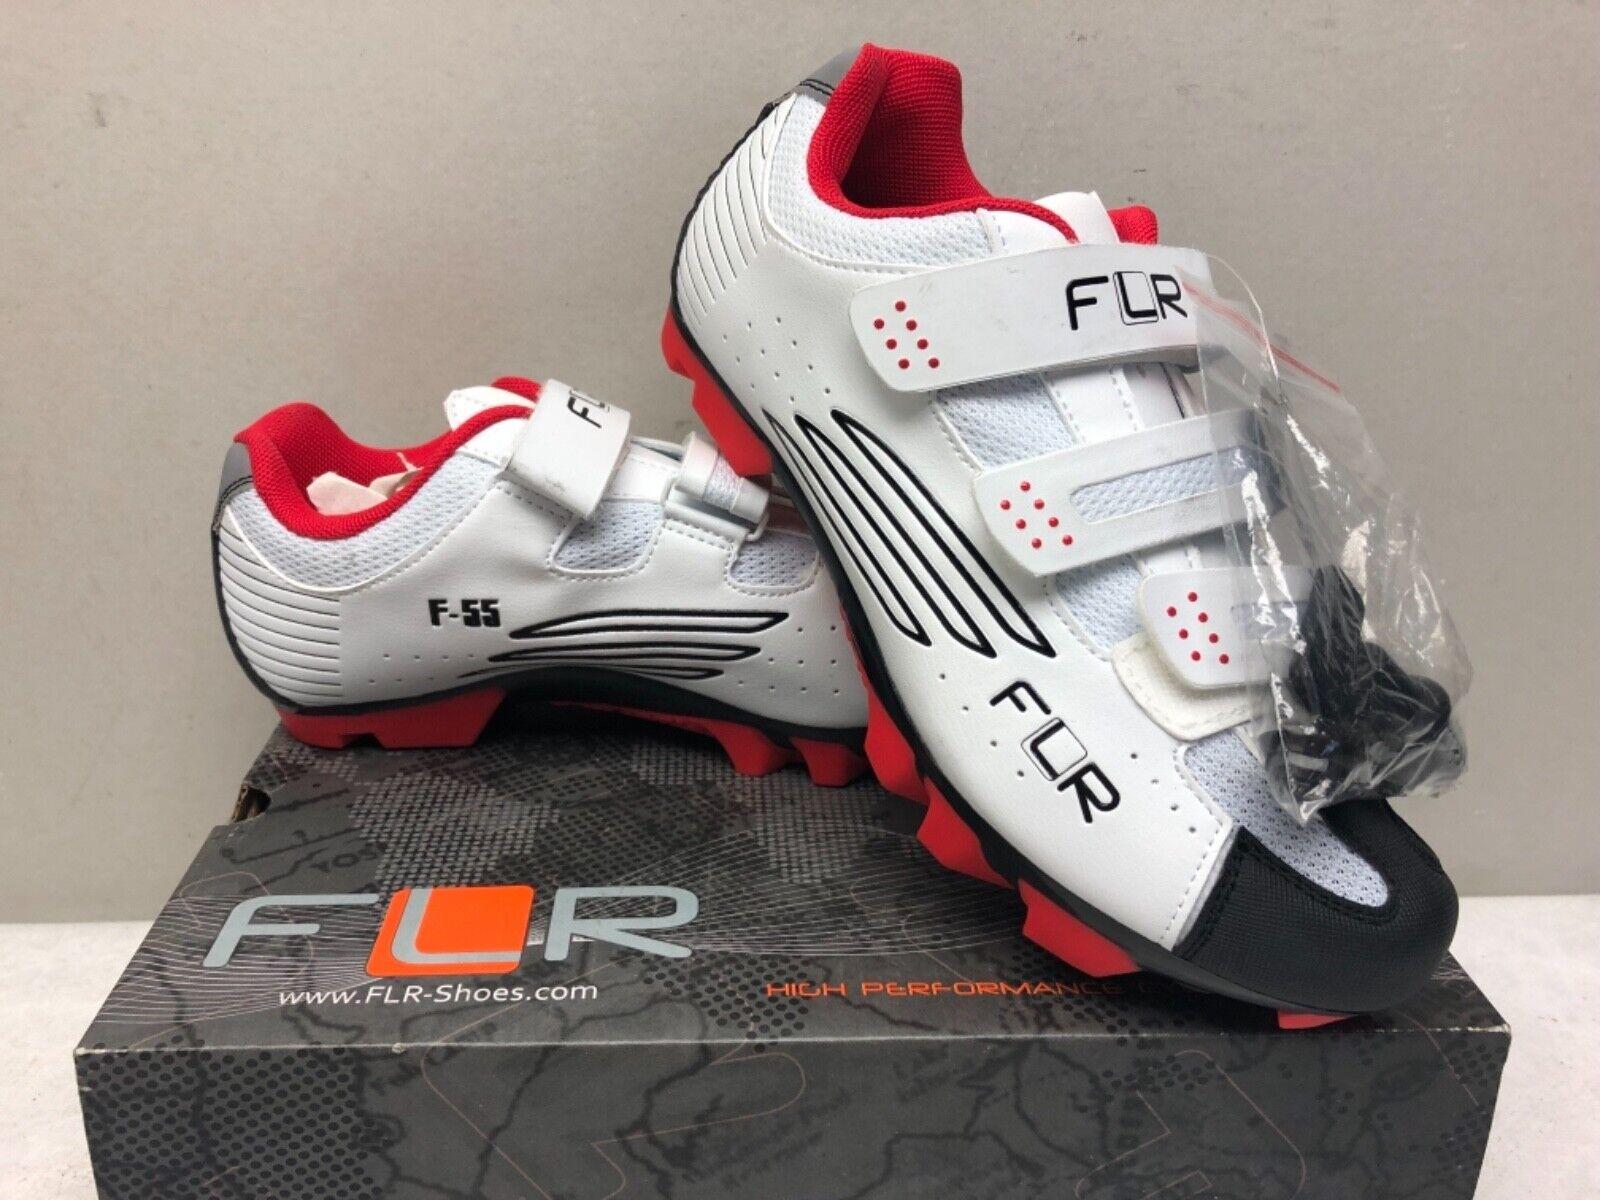 FLR F-55 II MTB Bike Cycling shoes in White (Size Eu 40) 2 Bolt System